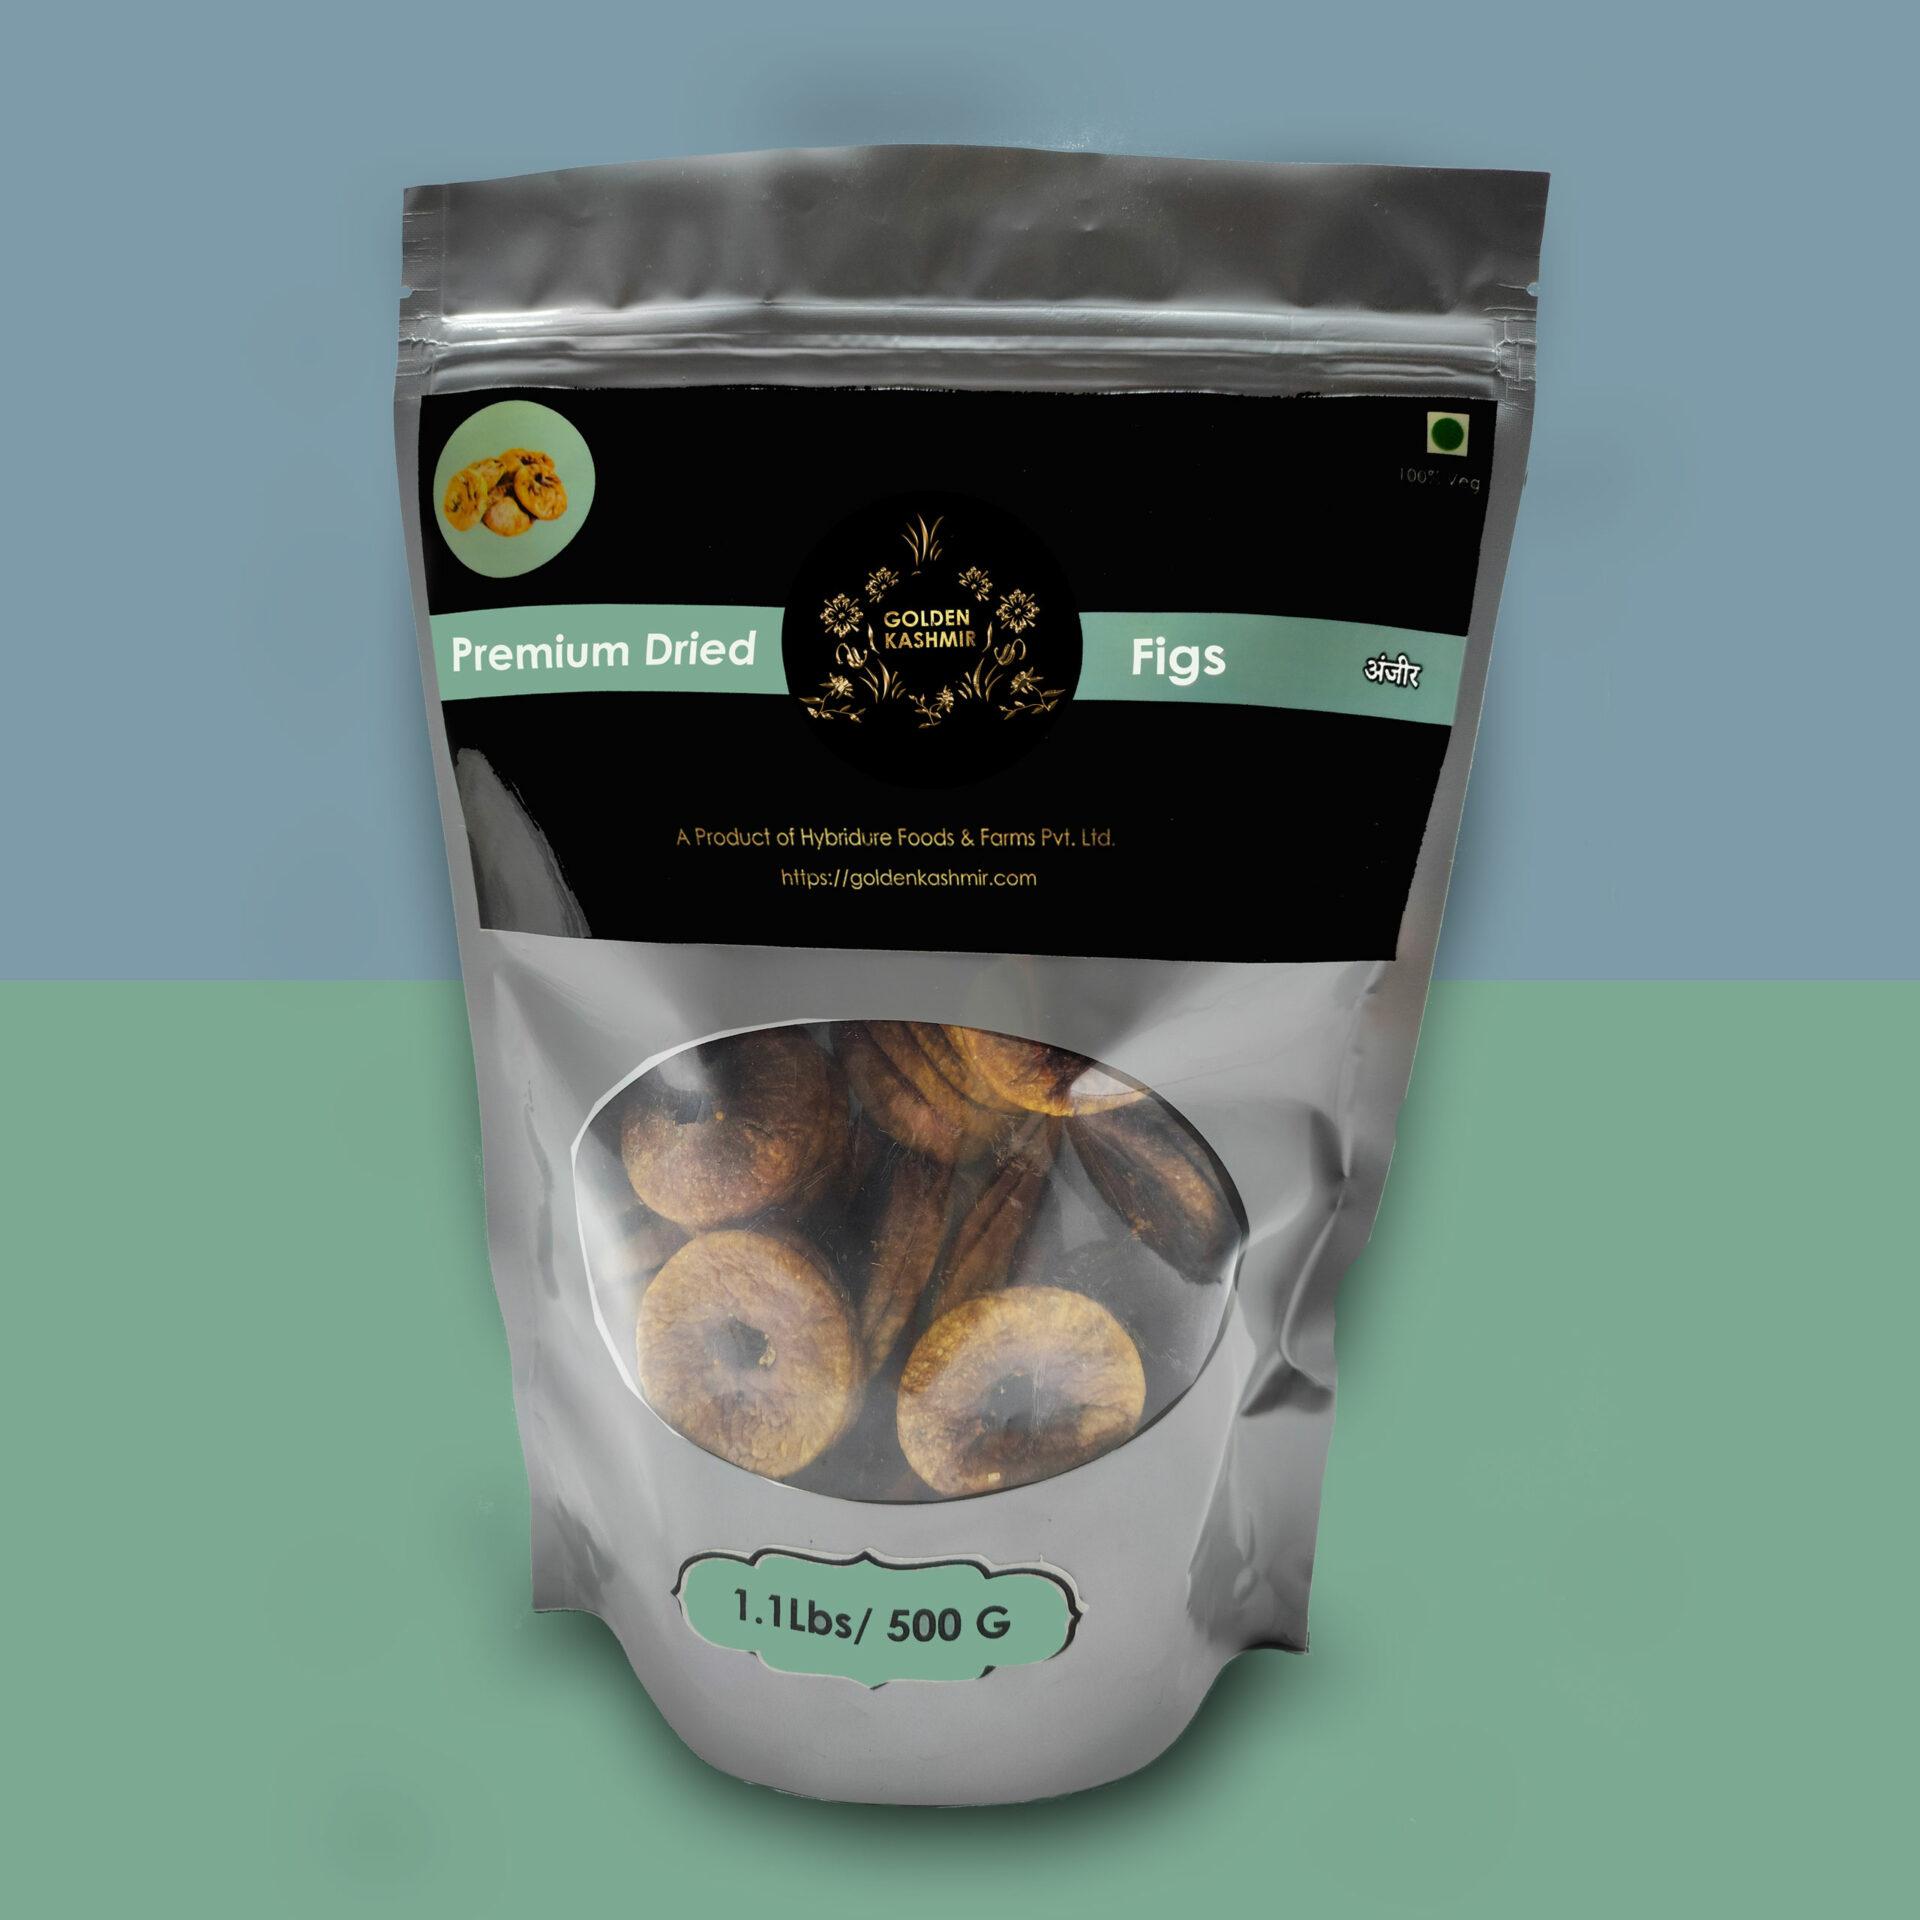 Golden Kashmir Premium Dried Figs   500G (1.1Lbs)